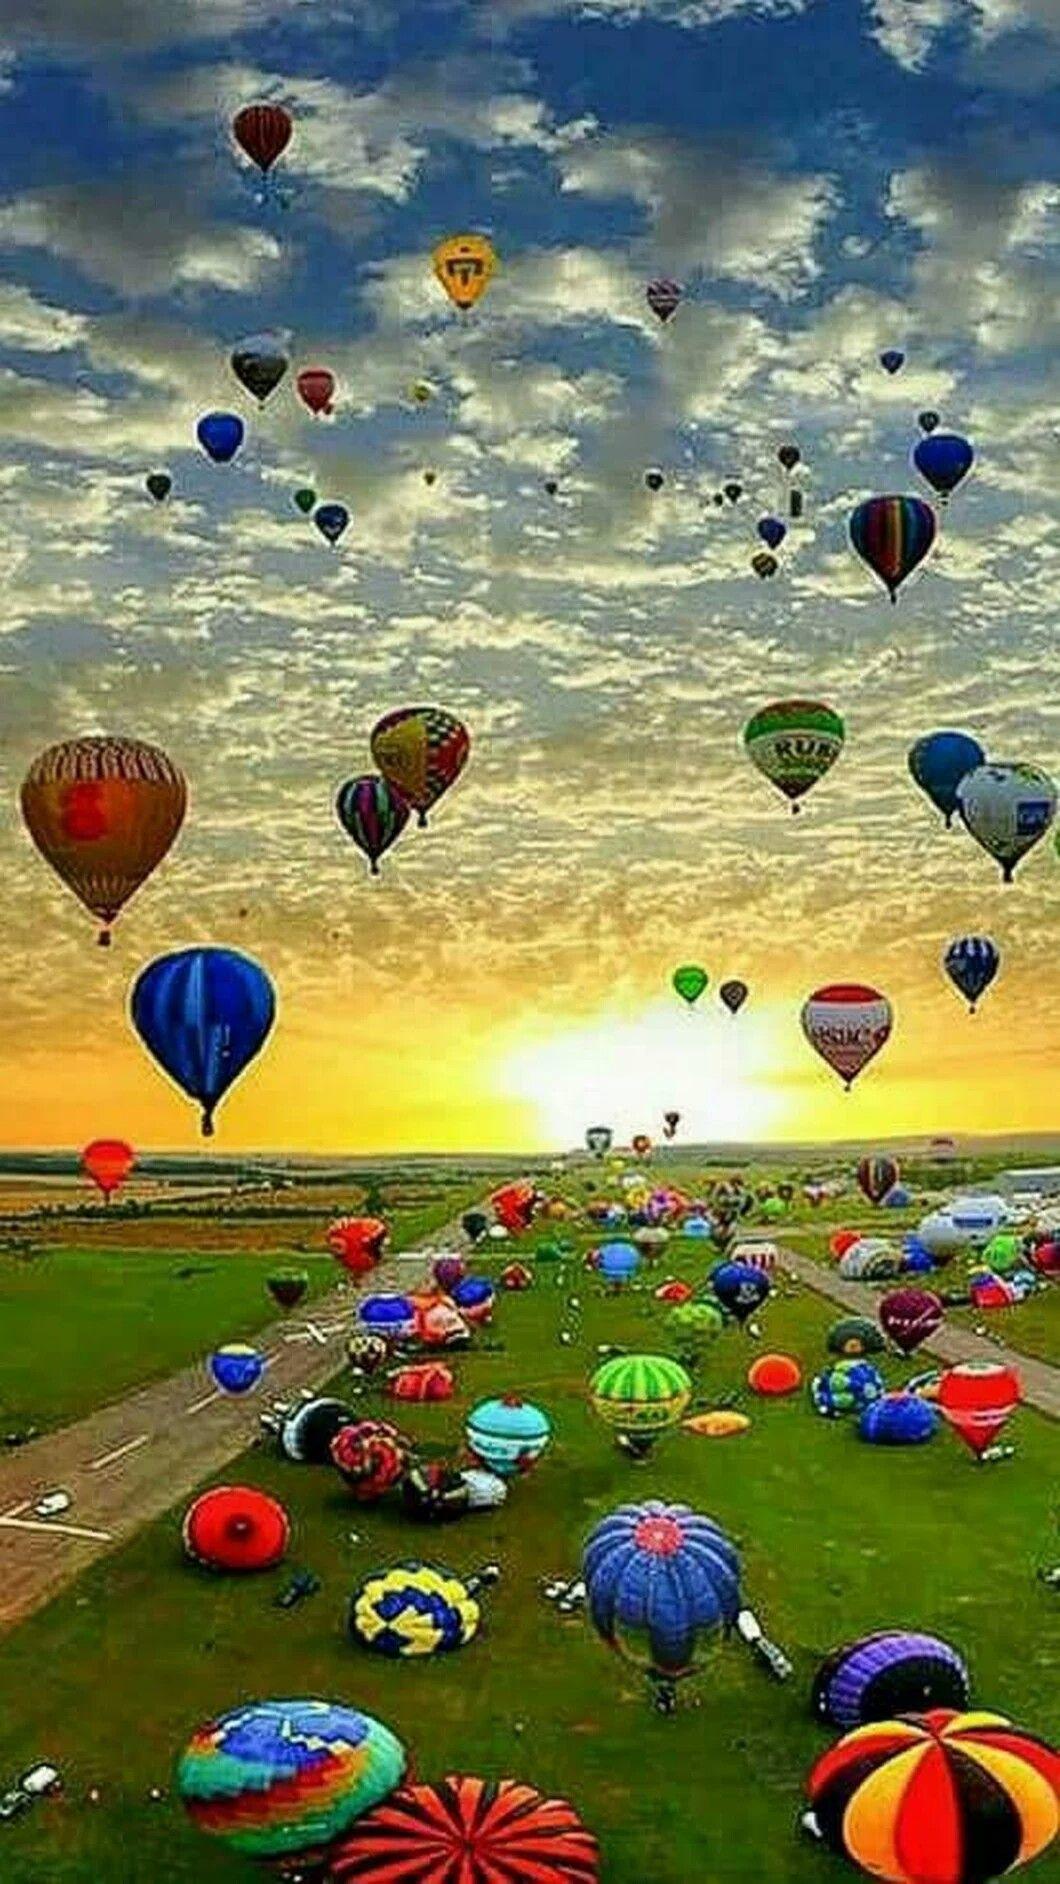 Hot Air Balloon (With images) Hot air balloon festival